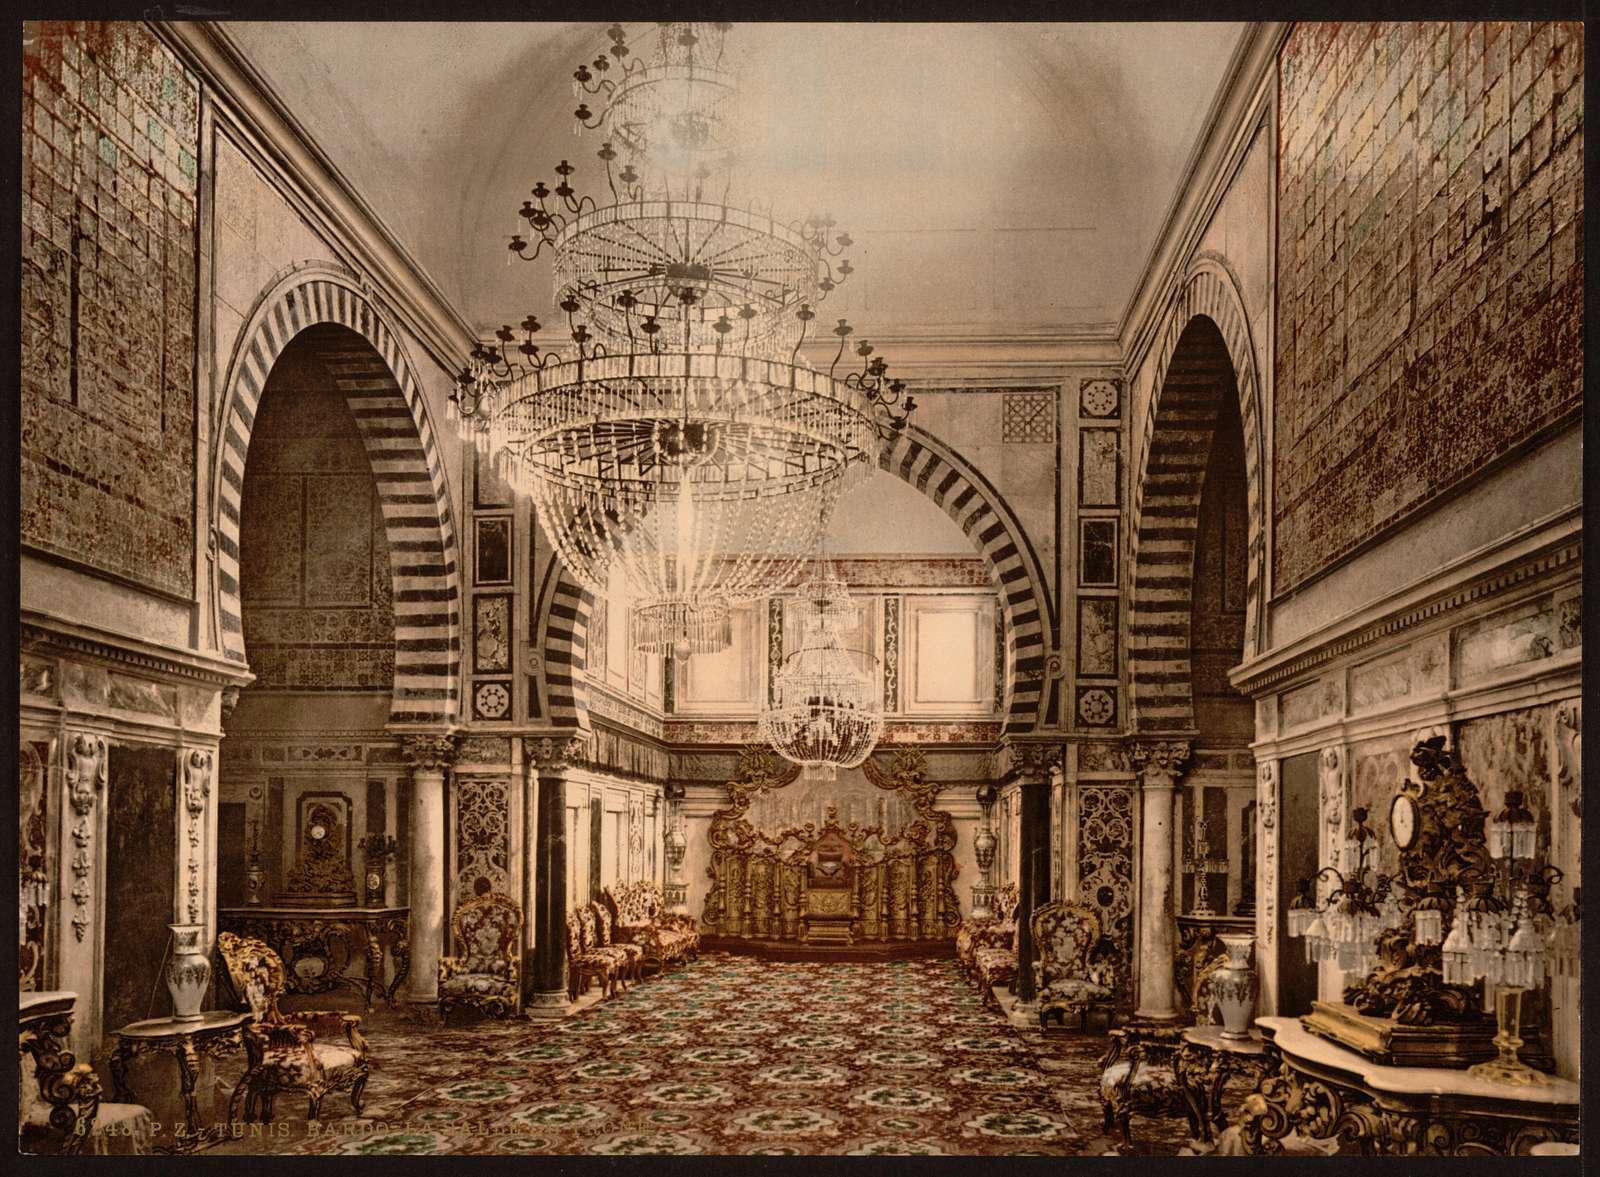 [Bardo, the throne room, Tunis, Tunisia]